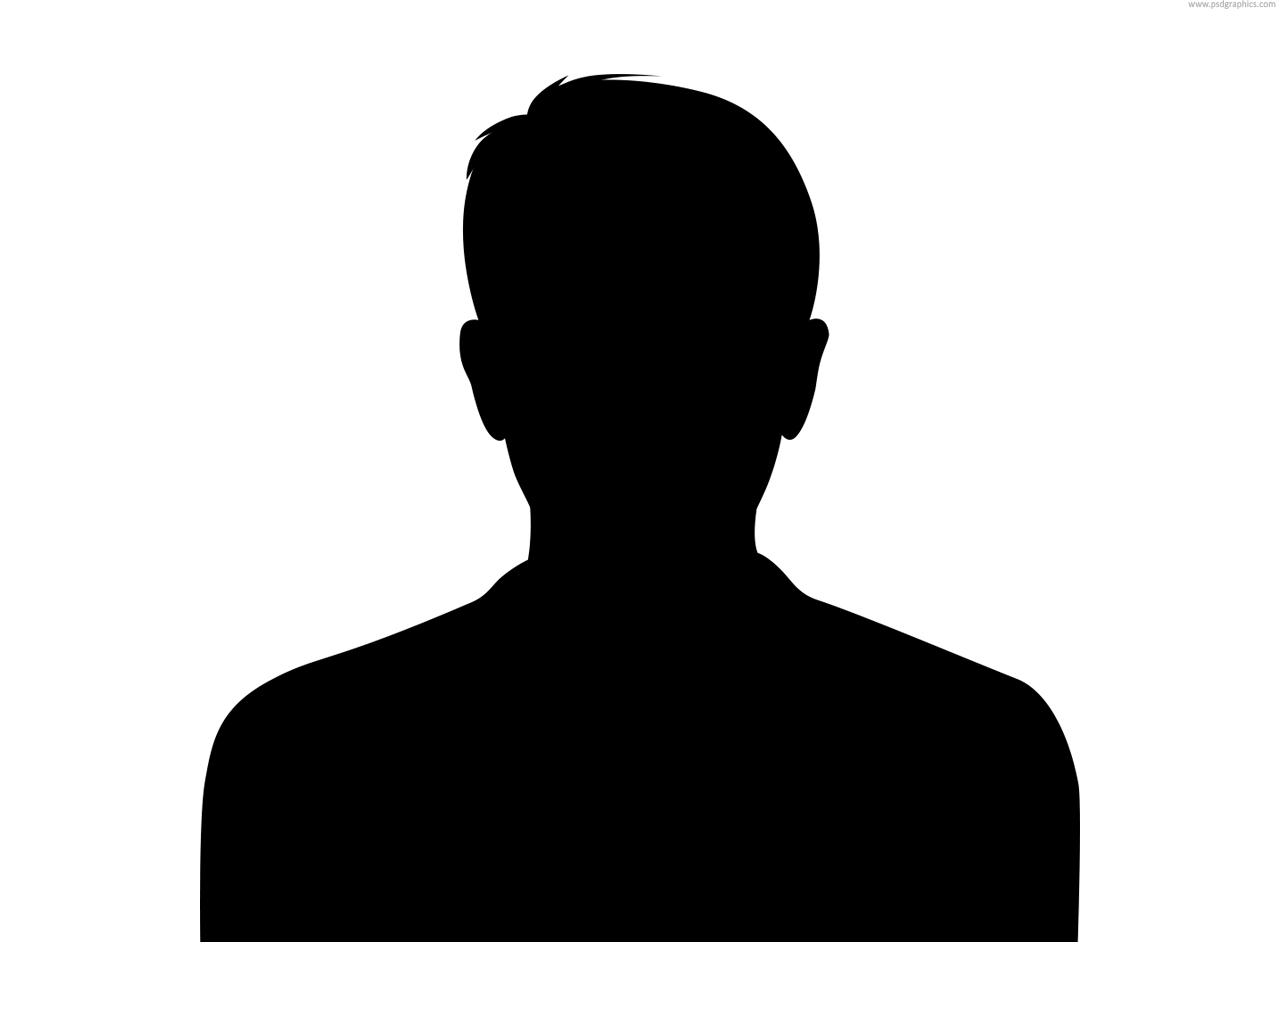 Business Person Silhouette.